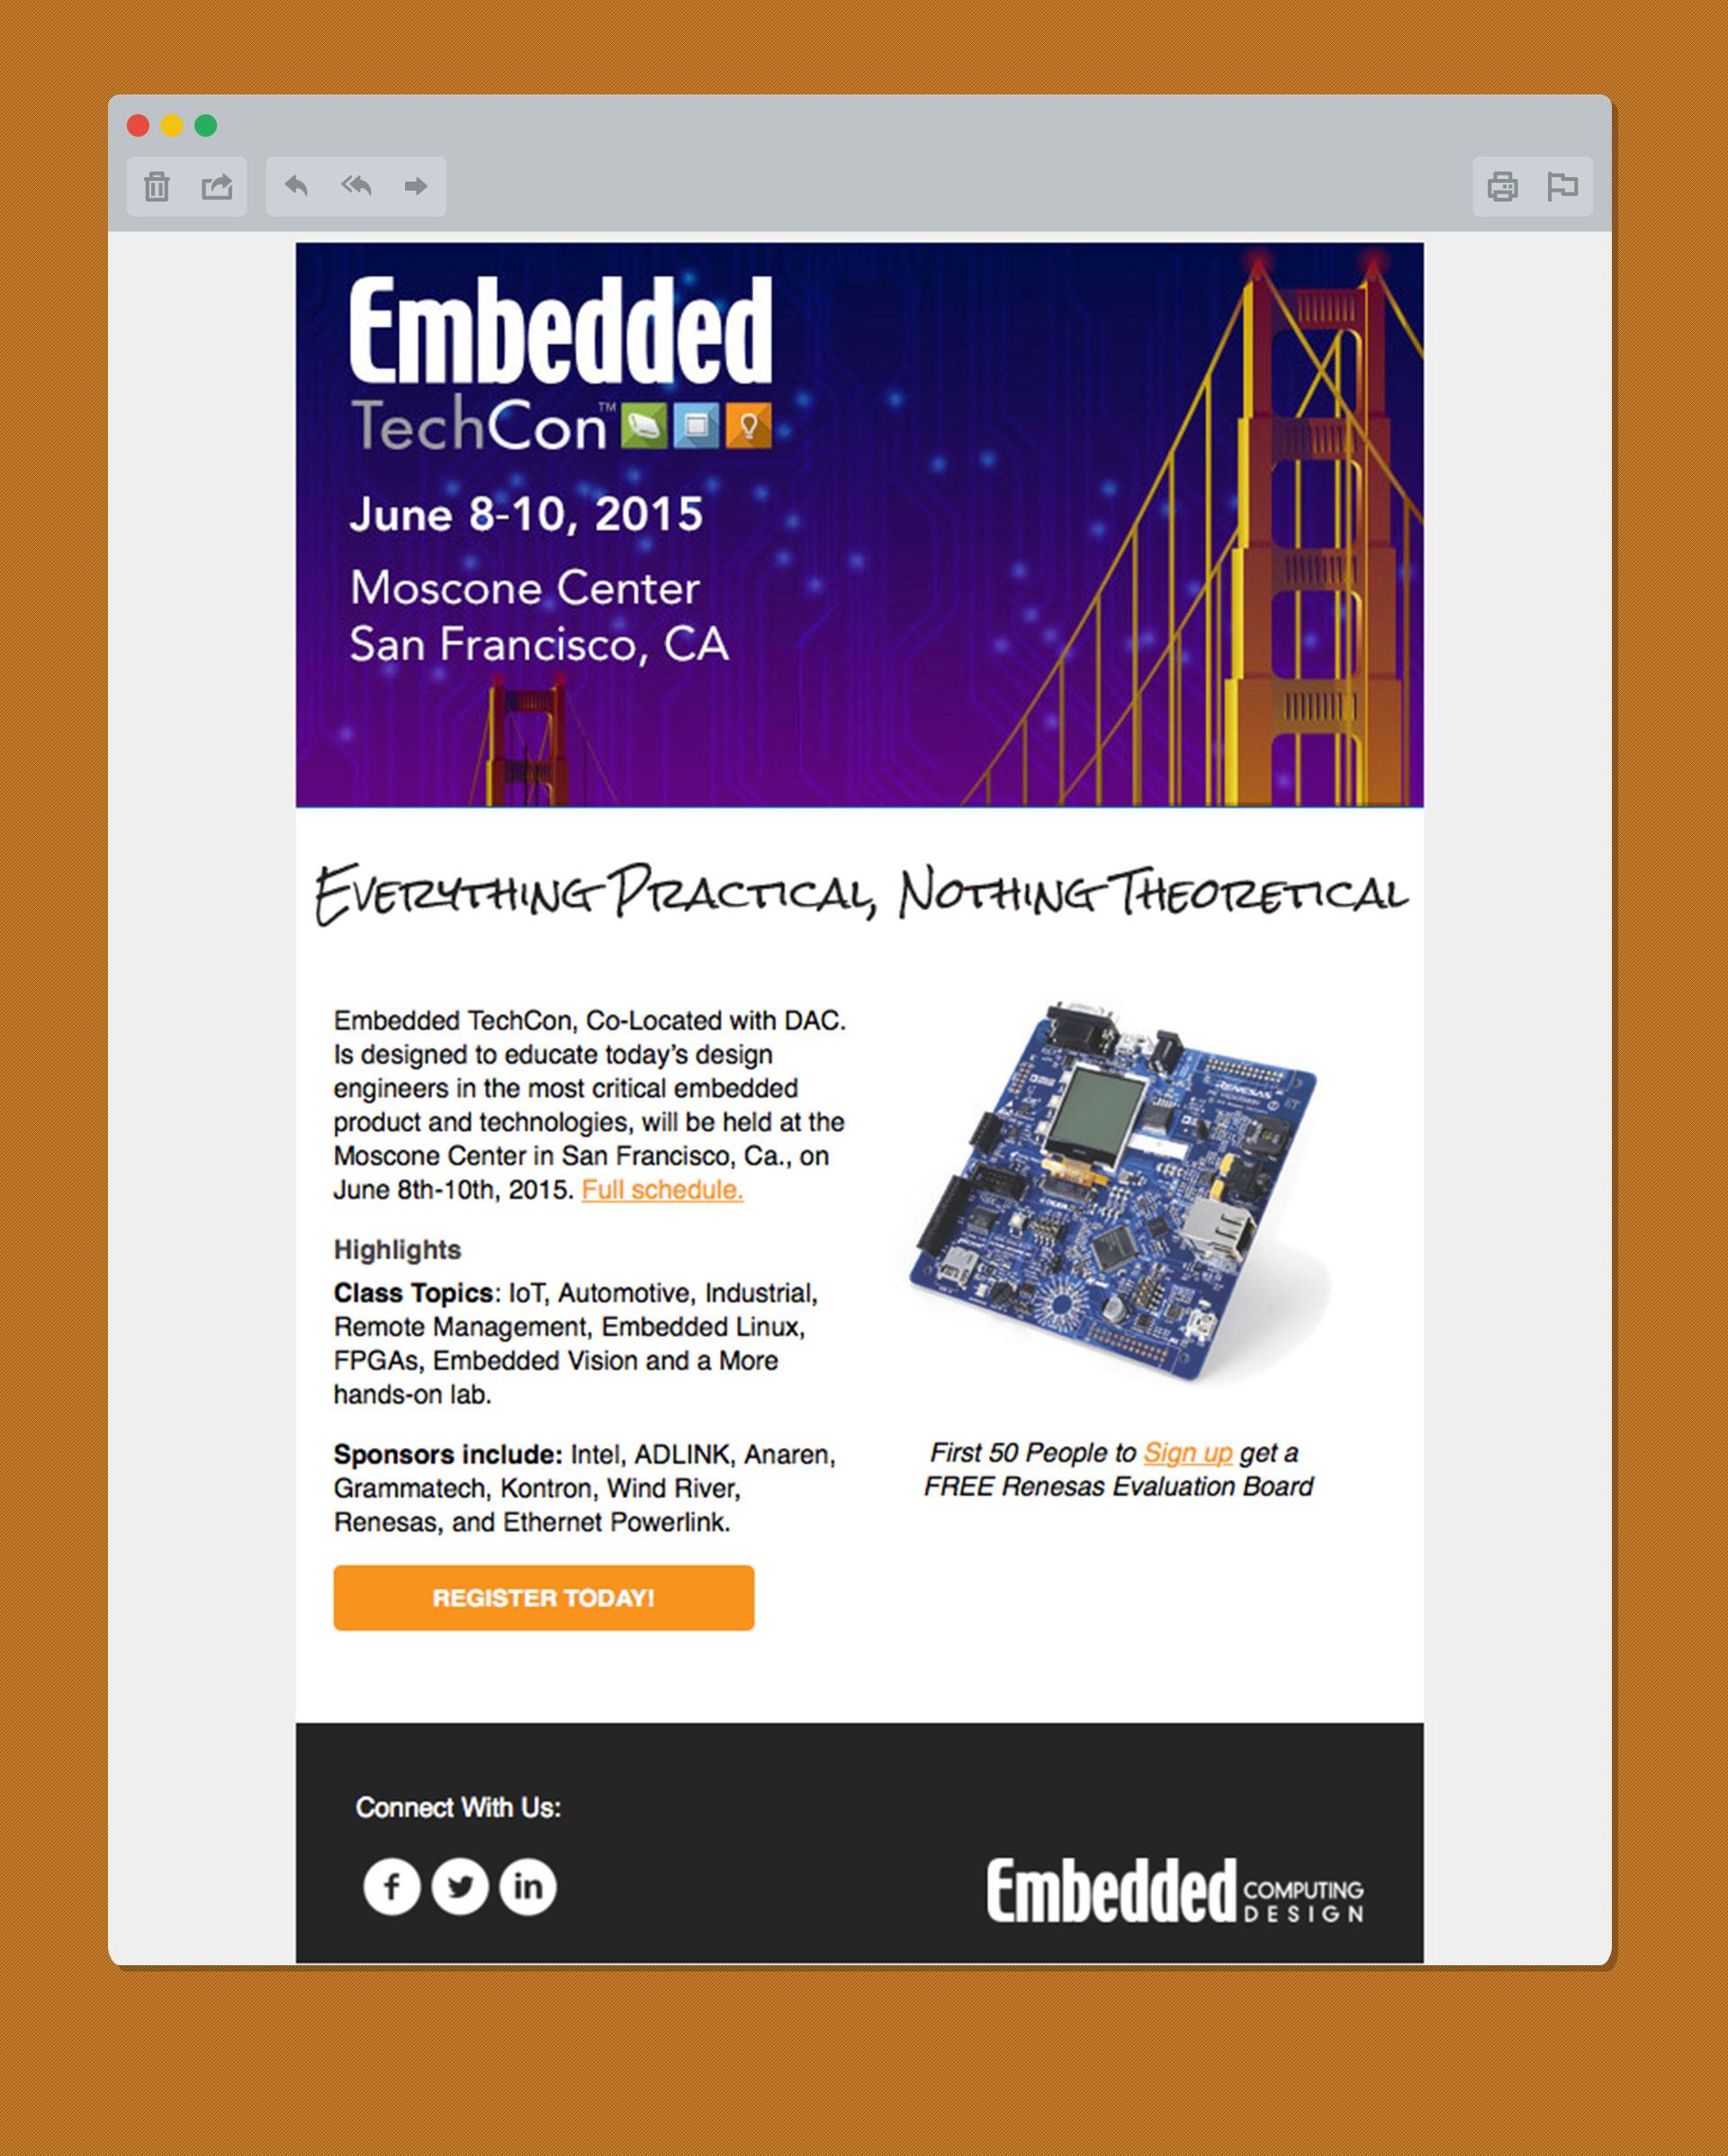 EmbeddedTechCon_mockup